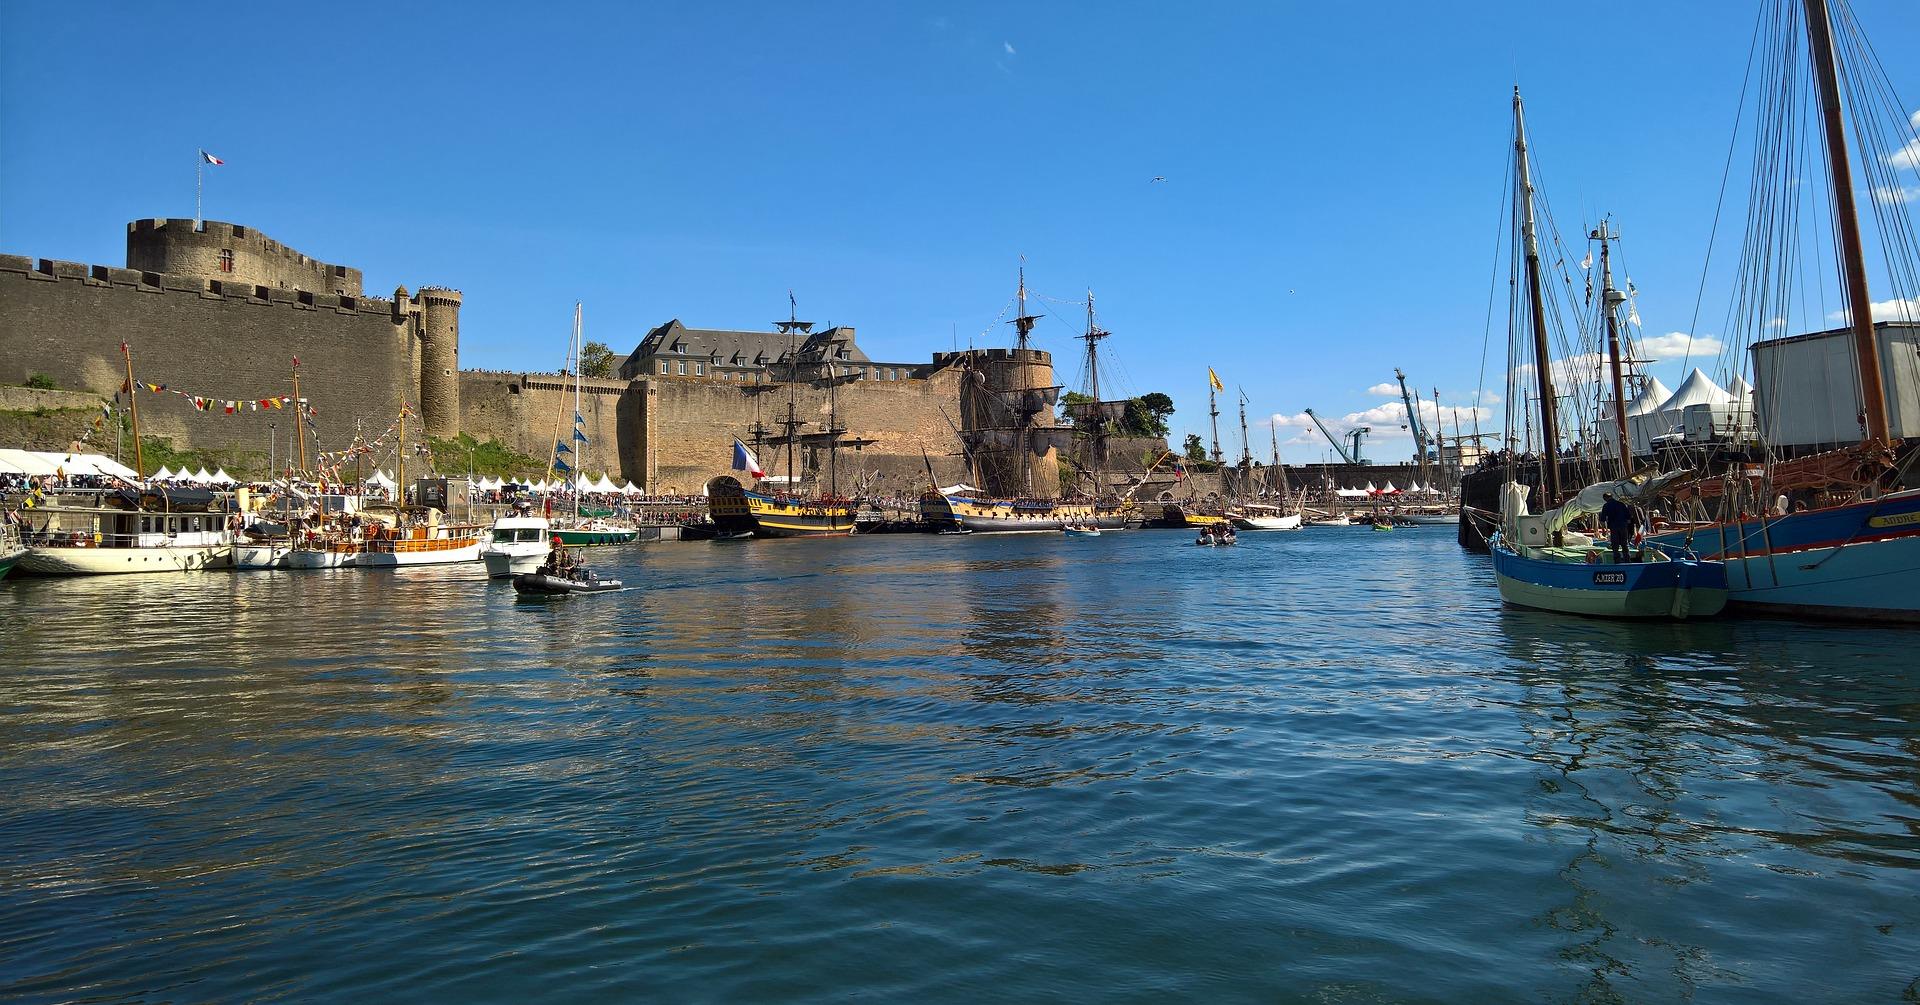 Port_de_Brest_CC0.jpg?1545472024